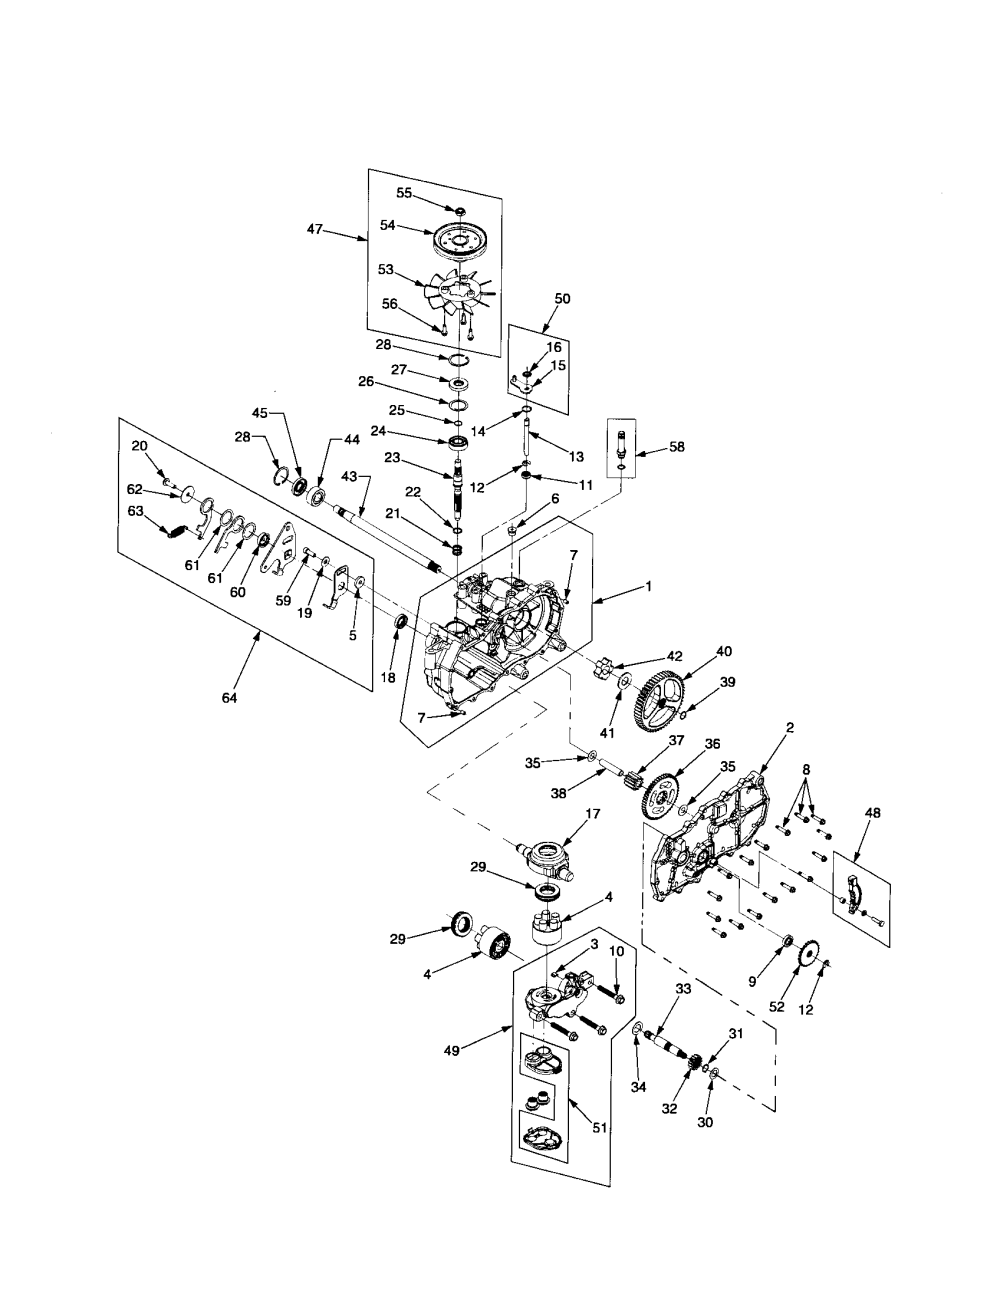 medium resolution of cub cadet rzt 42 wiring diagram free download